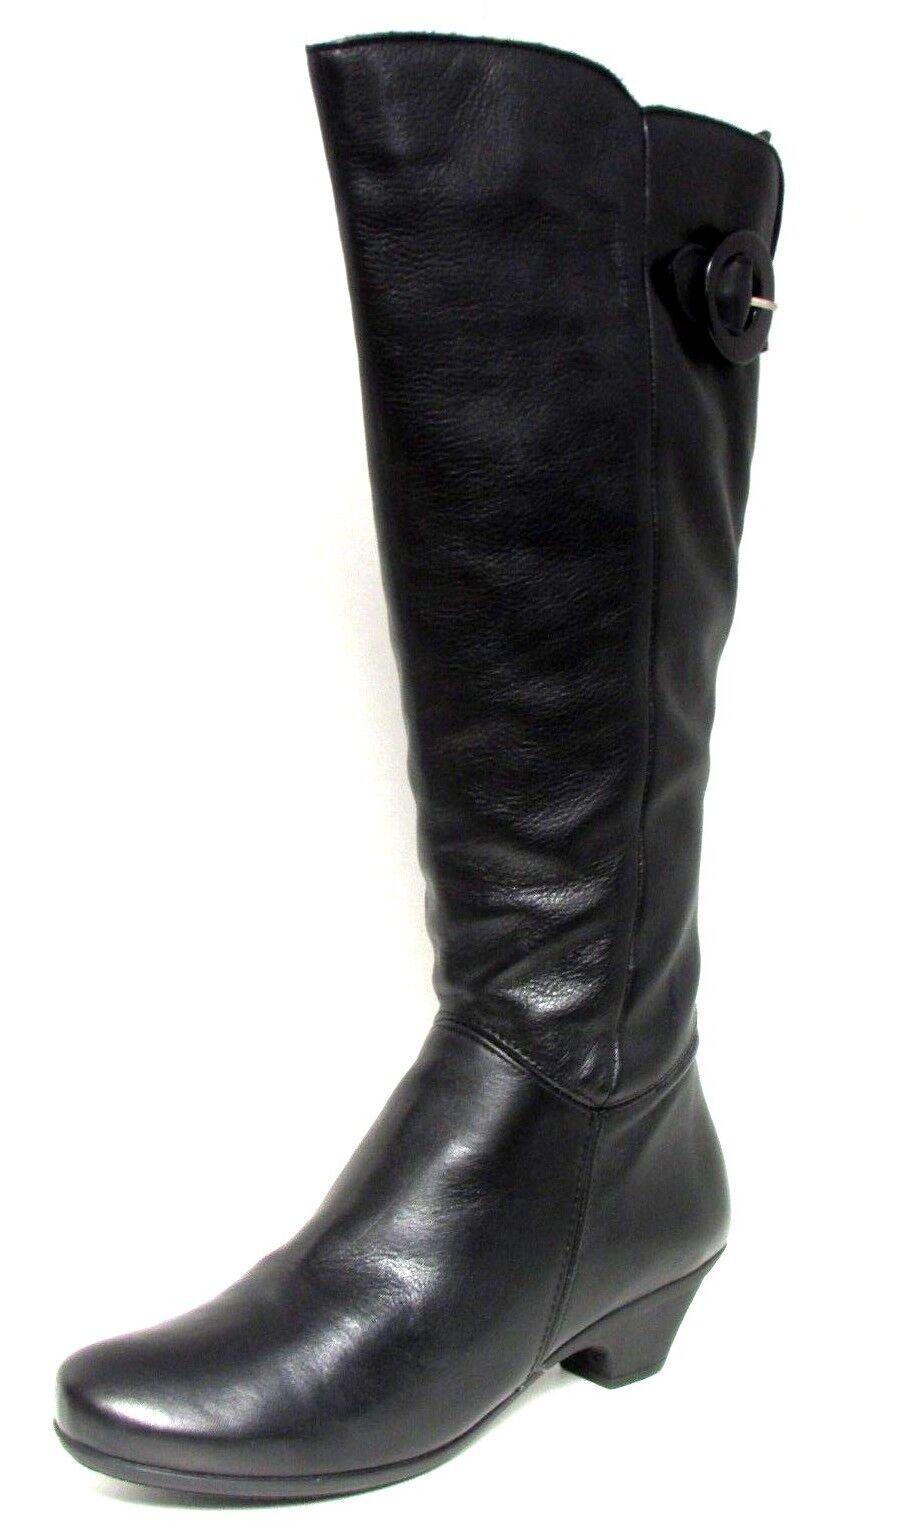 Bottes A PETIT TALON 40 cuir noir zip boucle MARIA JAEN femme NEUF